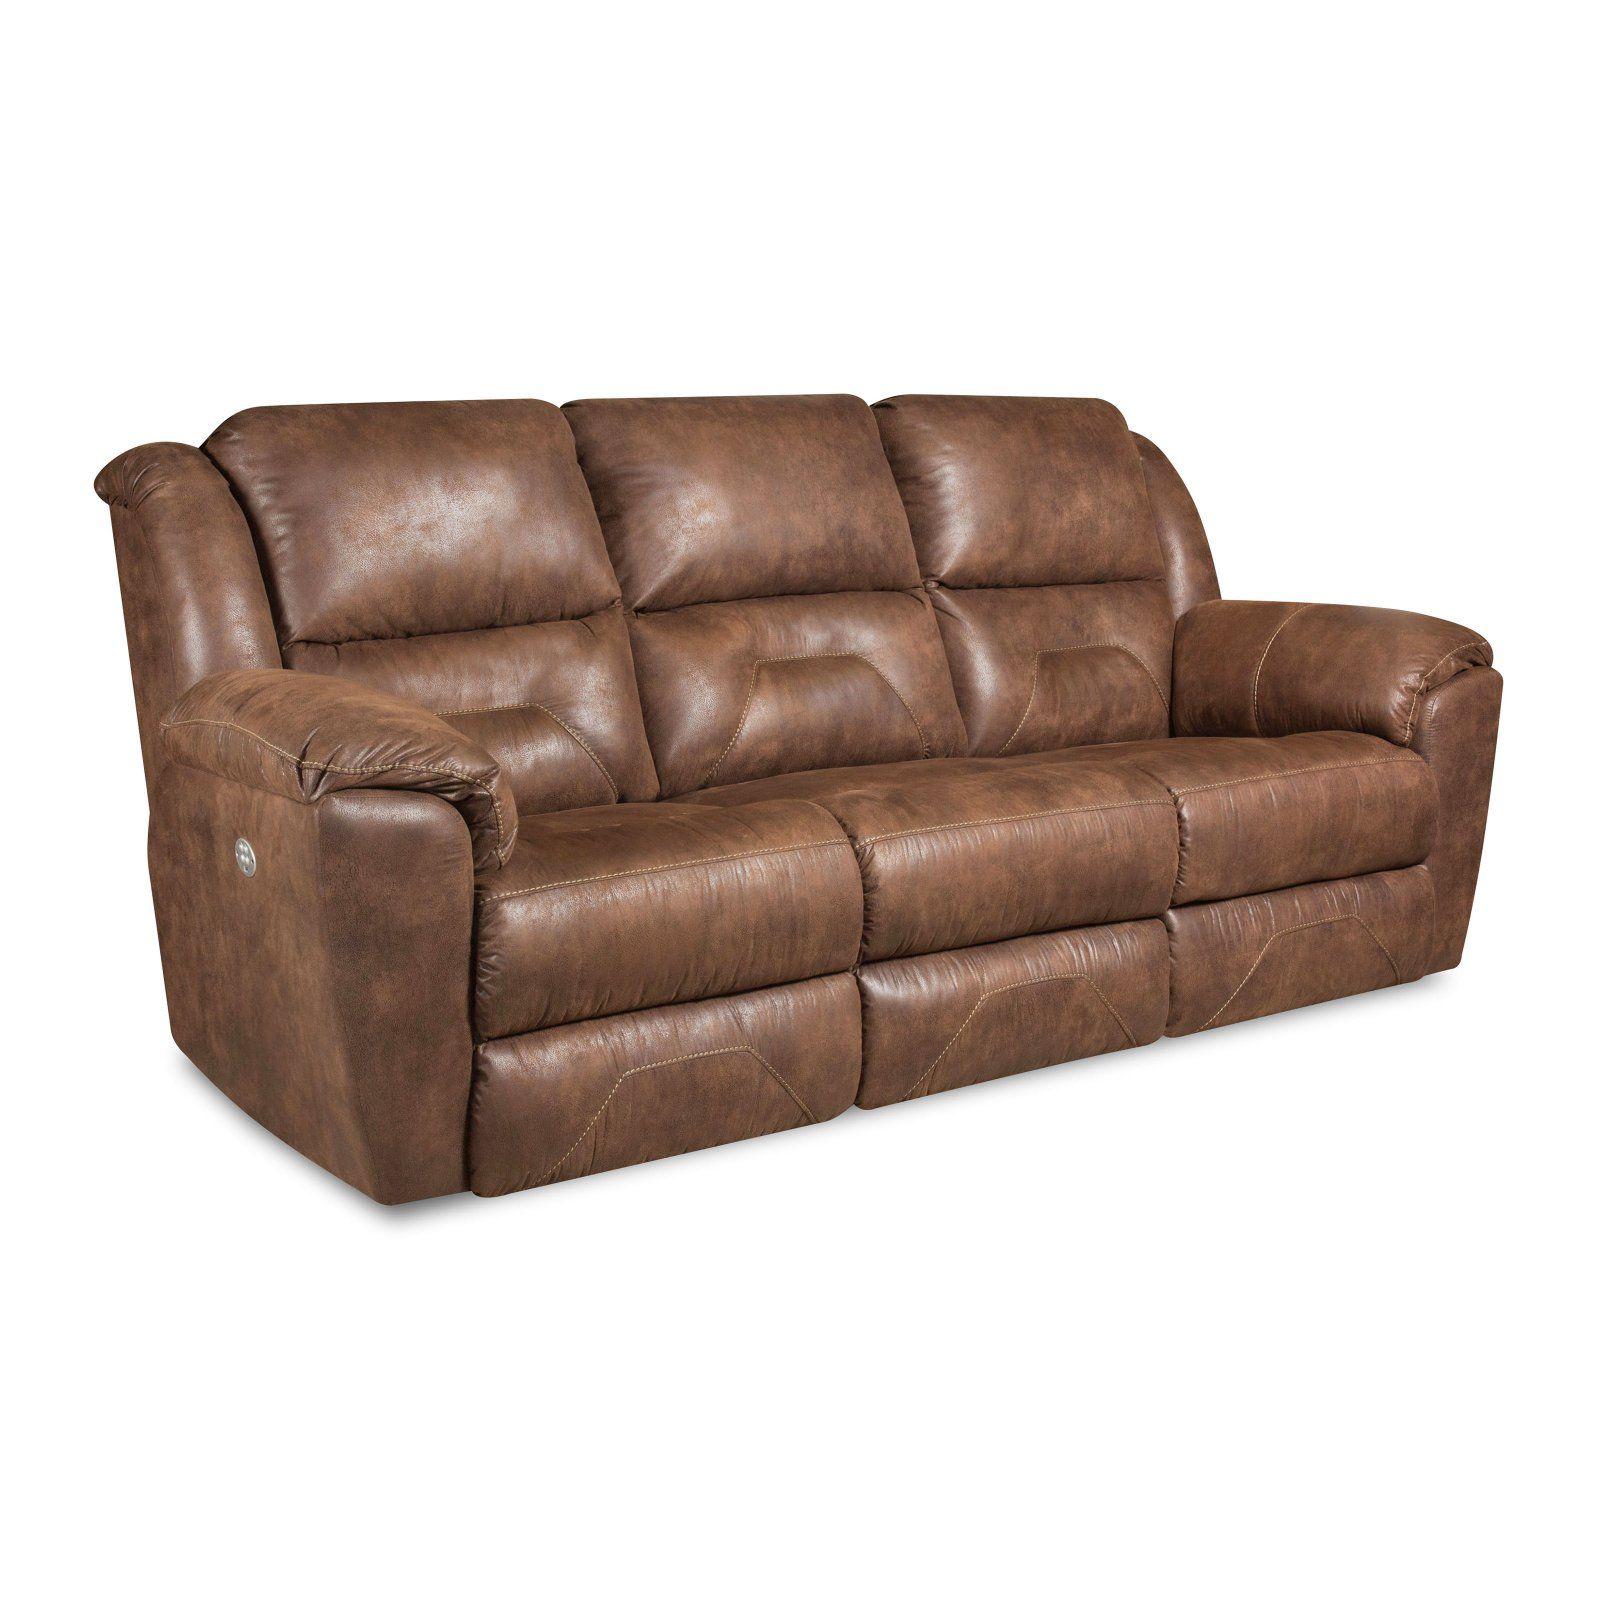 Peachy Recline Designs Splendid Brown Double Reclining Sofa With Frankydiablos Diy Chair Ideas Frankydiabloscom